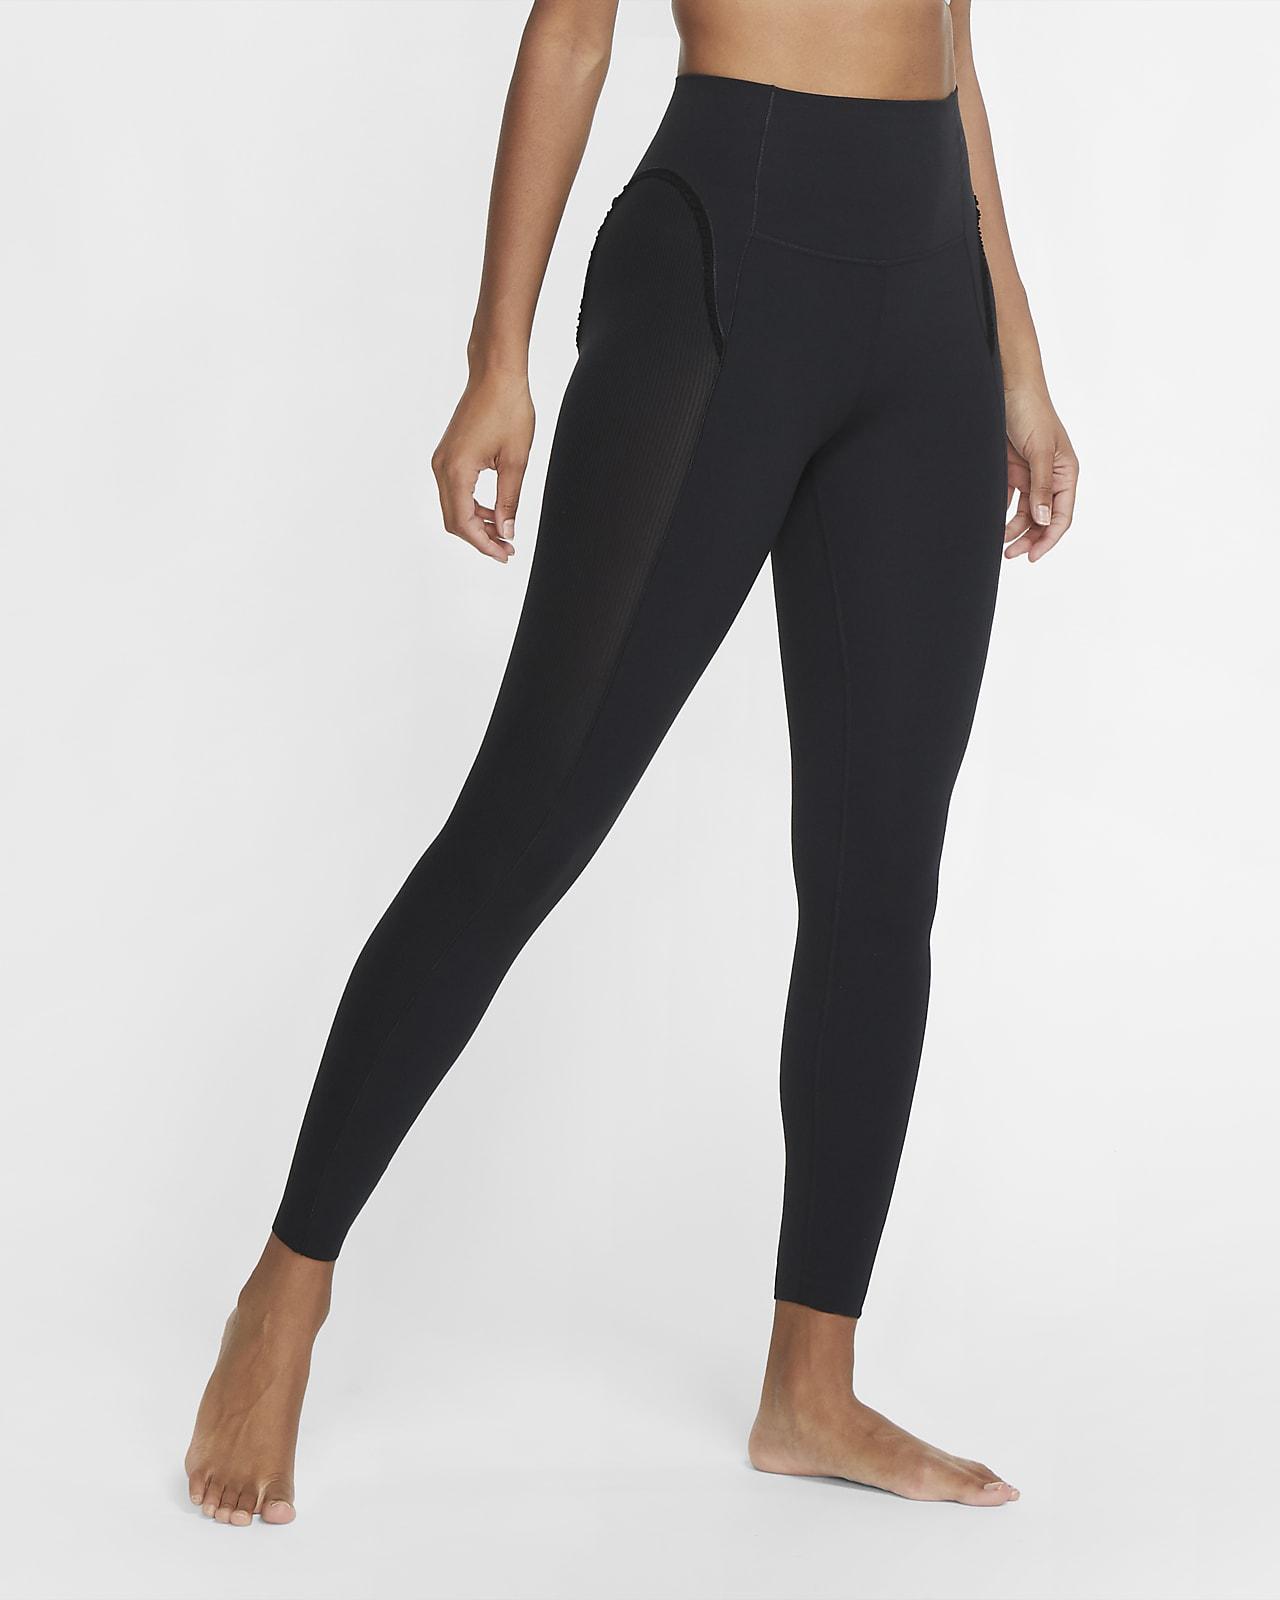 Nike Yoga Luxe Women's Infinalon Ruffled 7/8 Leggings